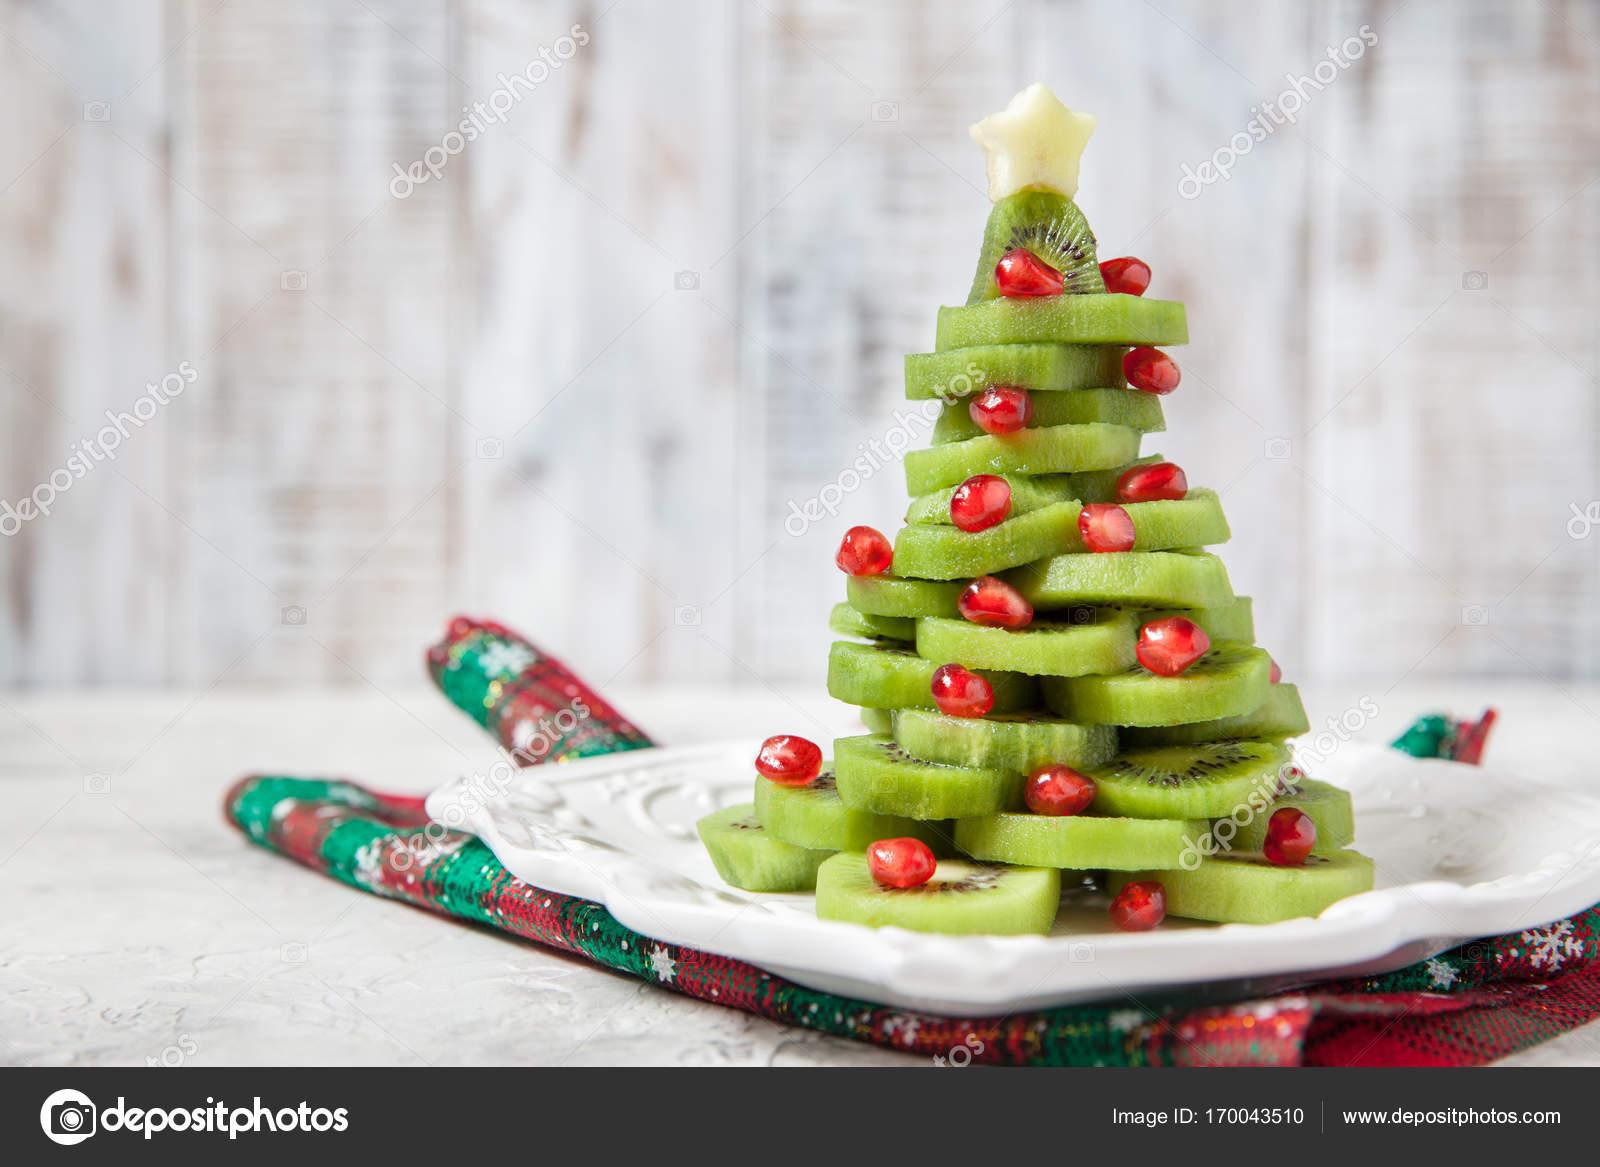 Healthy dessert idea for kids party - funny edible kiwi pomegranate ...